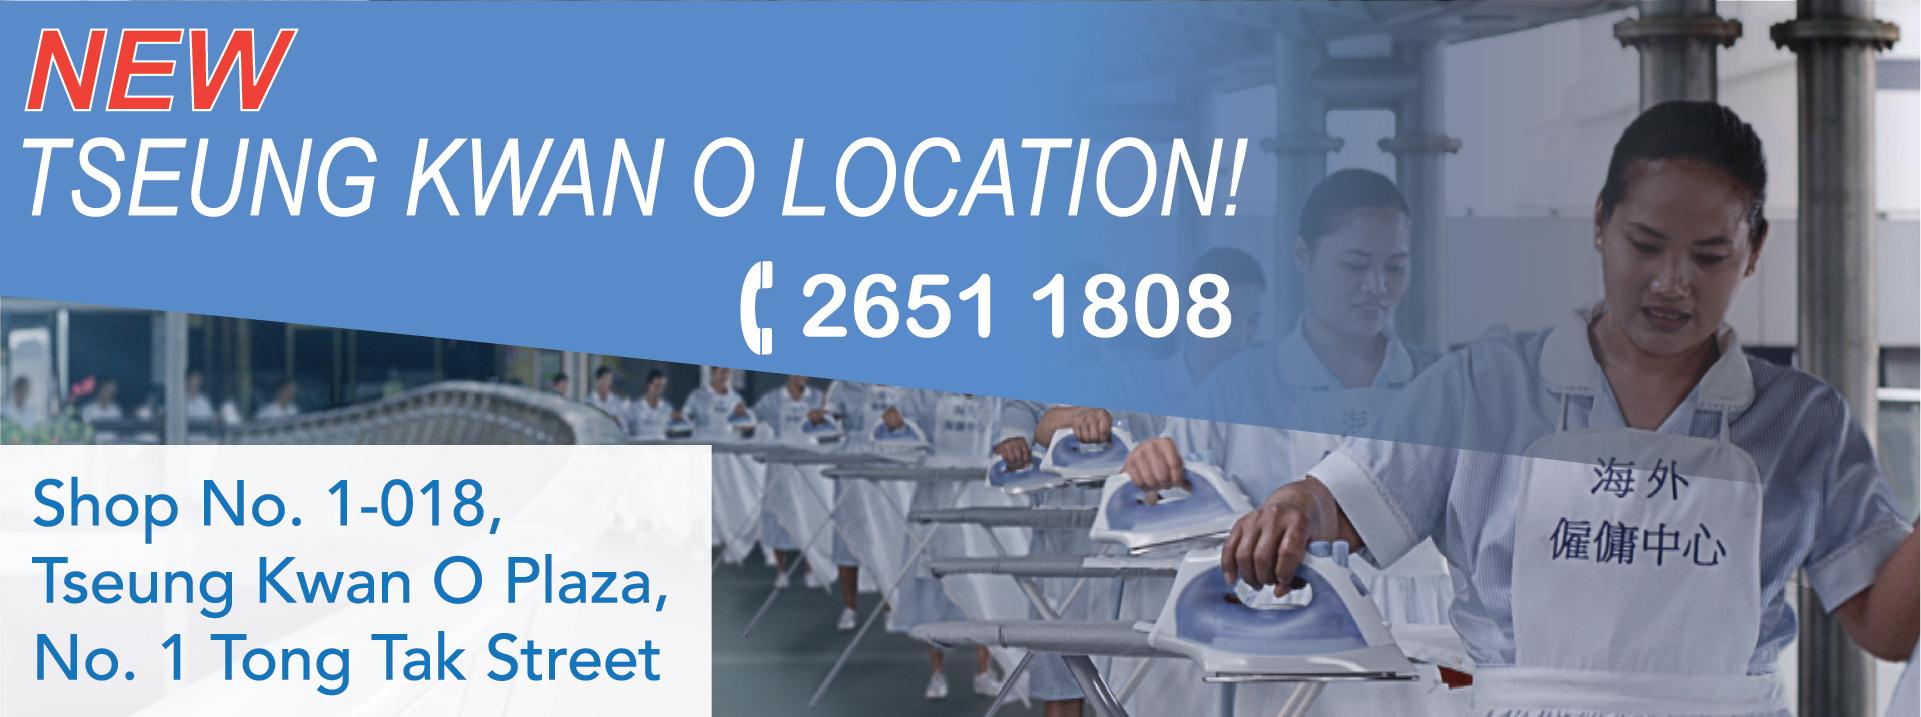 Overseas Employment Center Ltd | Just another WordPress site